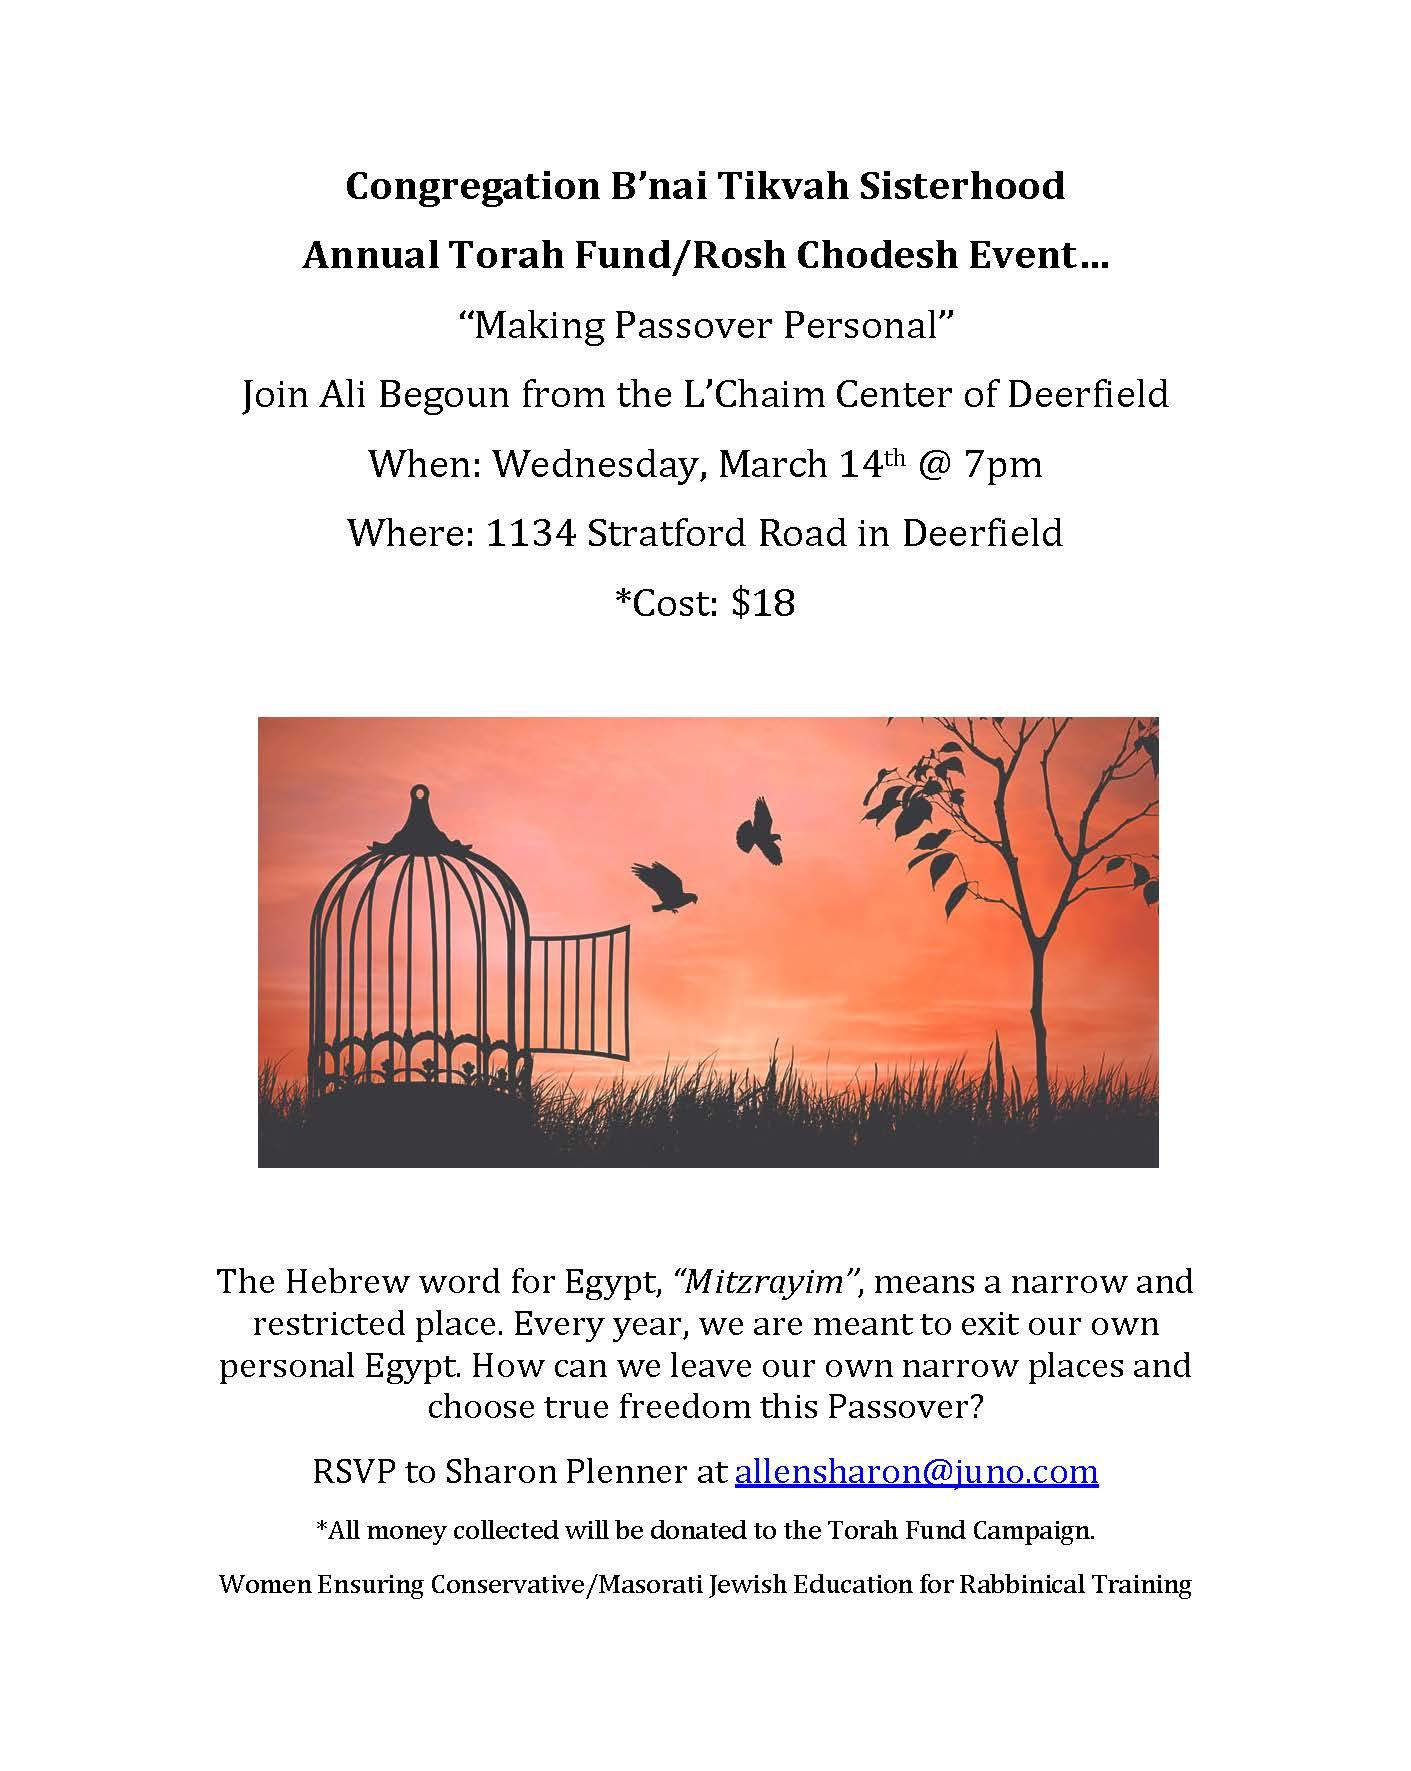 B'nai Tikvah Sisterhood Annual Torah Fund/Rosh Chodesh Event